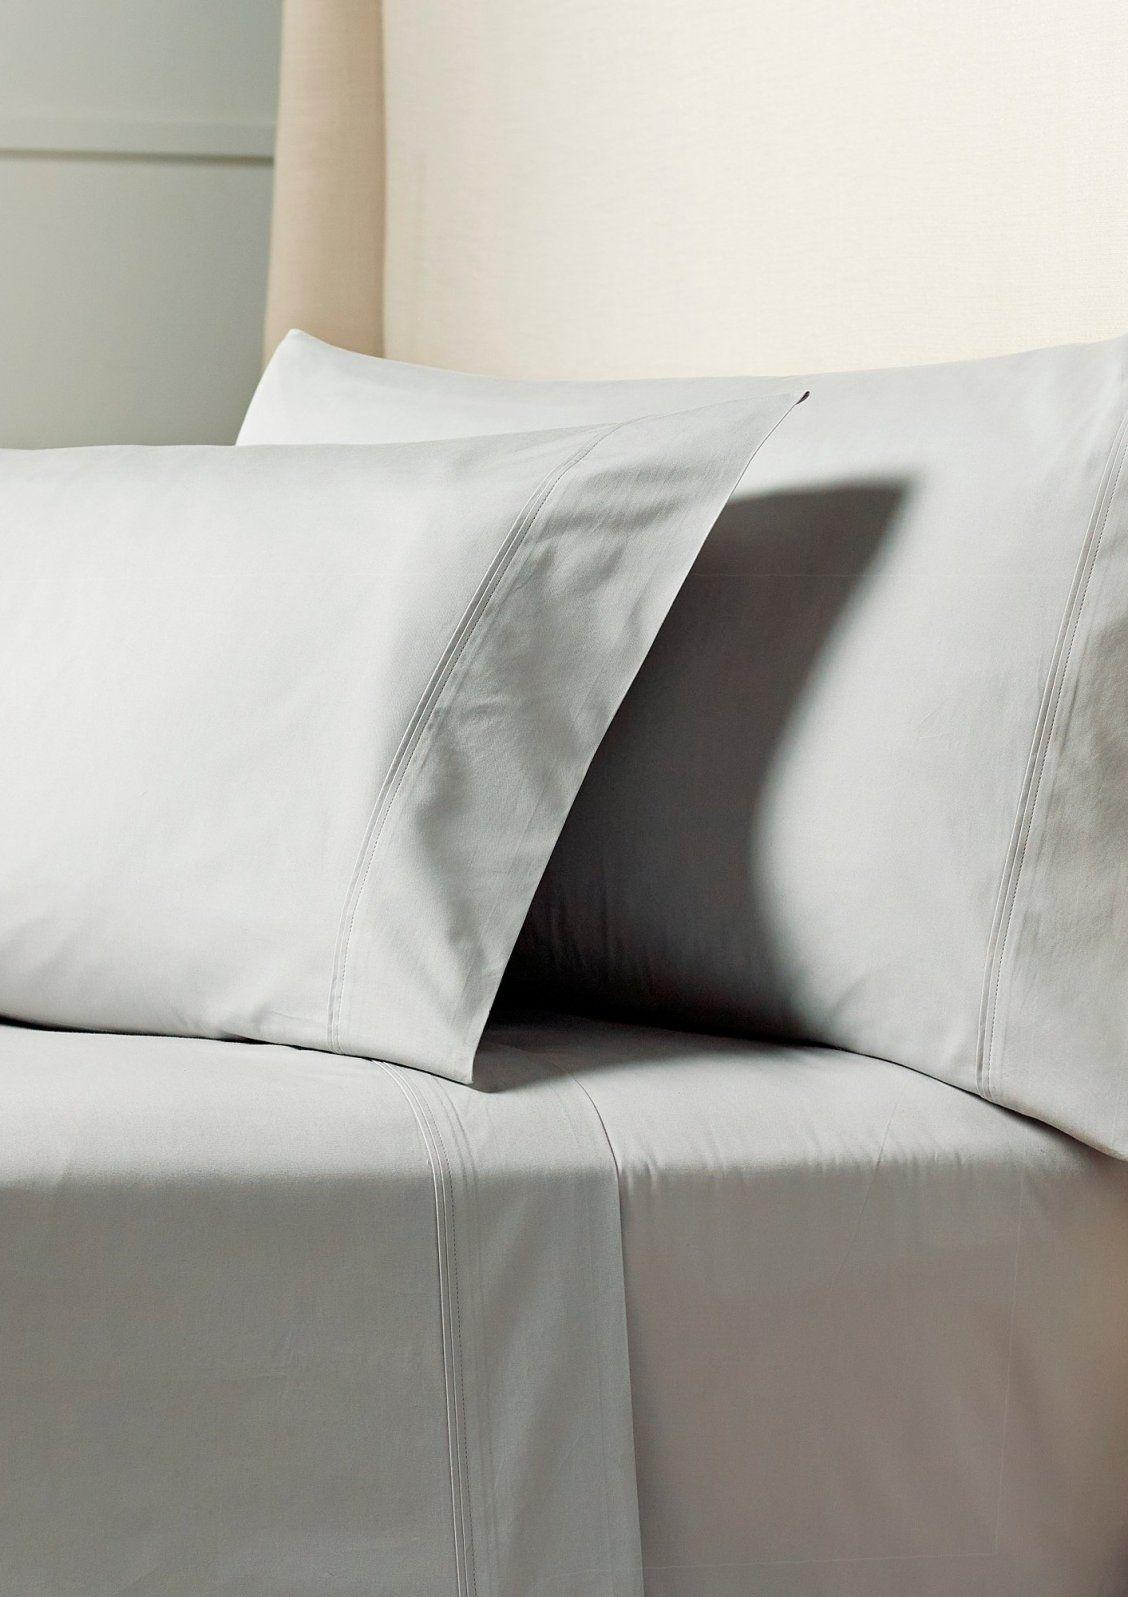 Resort Pintuck Egyptian Cotton Percale Sheet Set Frontgate In 2021 Egyptian Cotton Sheet Sets Frontgate 100 egyptian cotton percale sheets